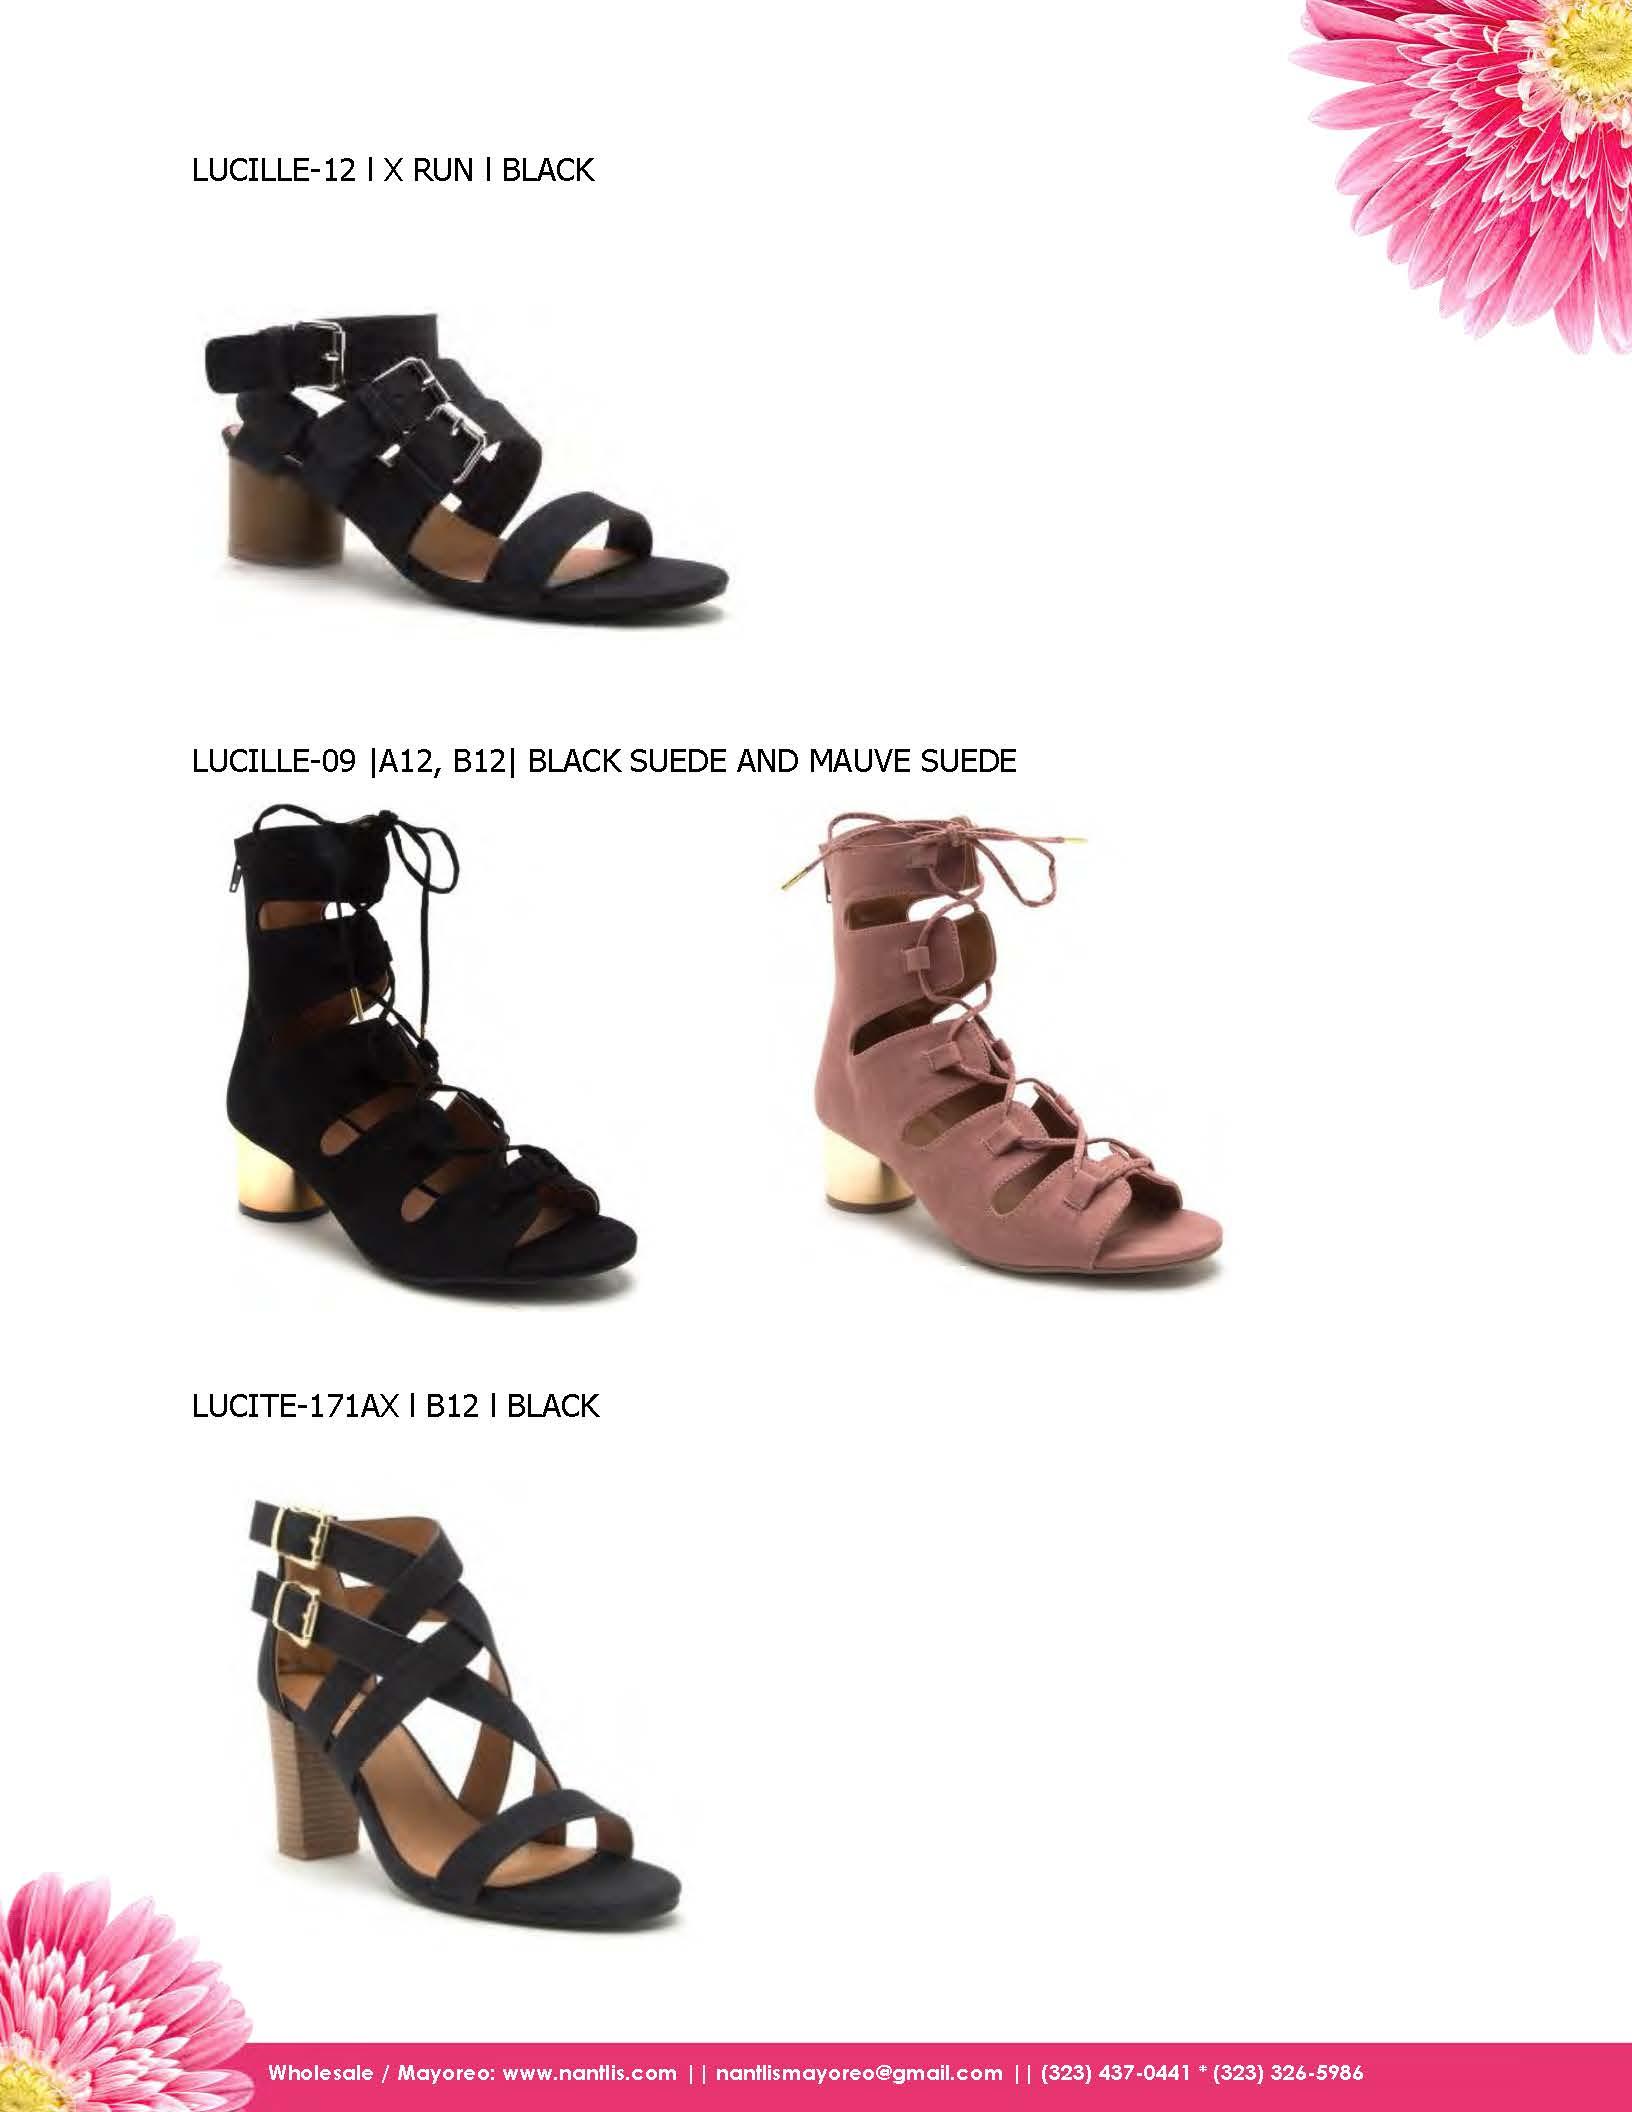 Nantlis Vol QU43 Zapatos para mujer mayoreo Wholesale shoes for women_Page_24